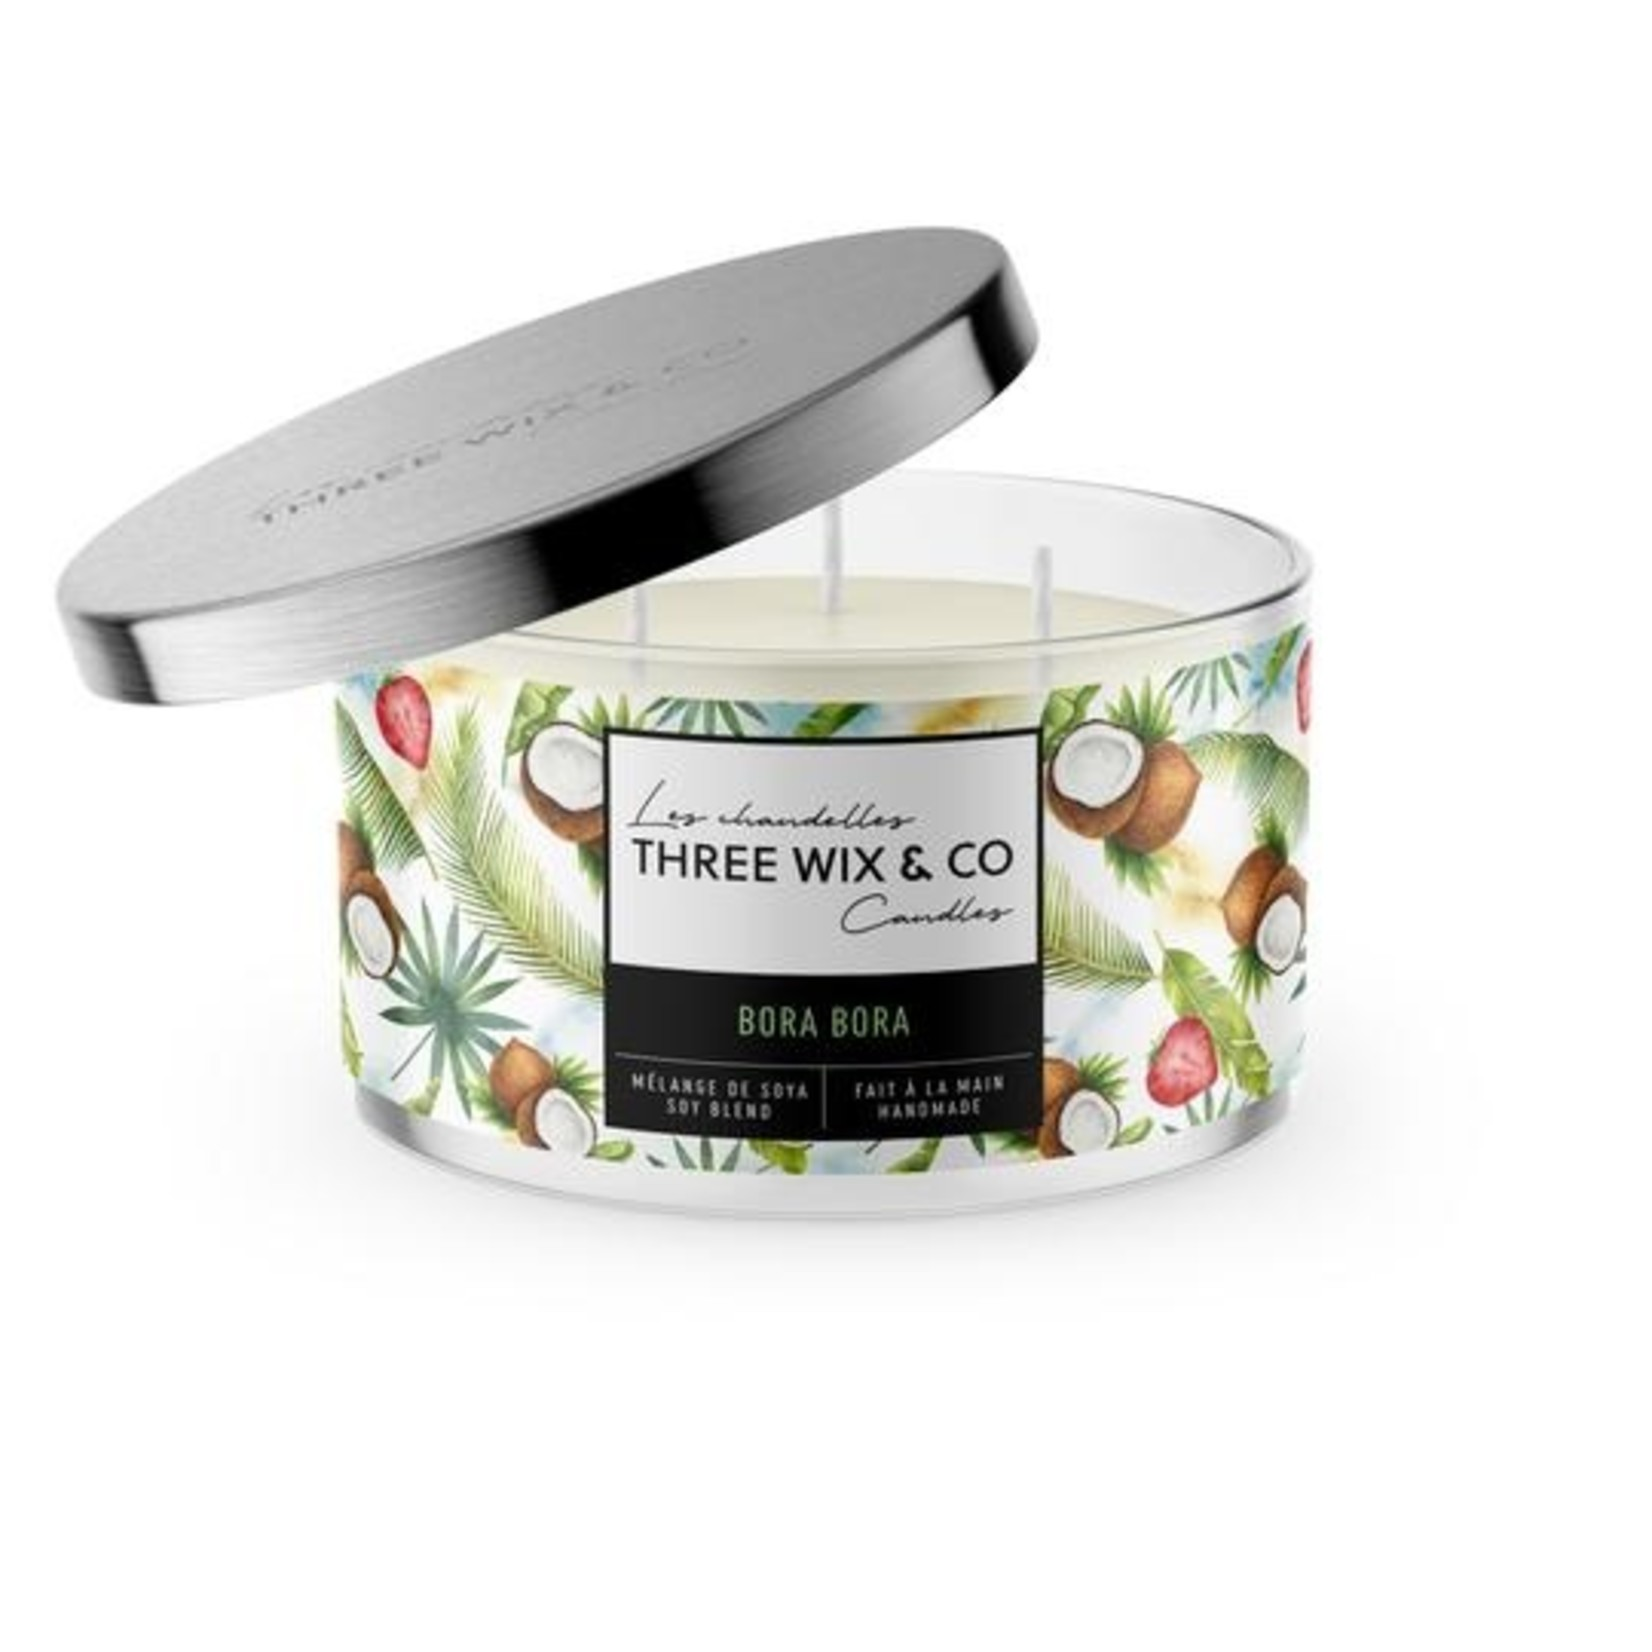 Three wix & co Bora Bora - Three wix & co